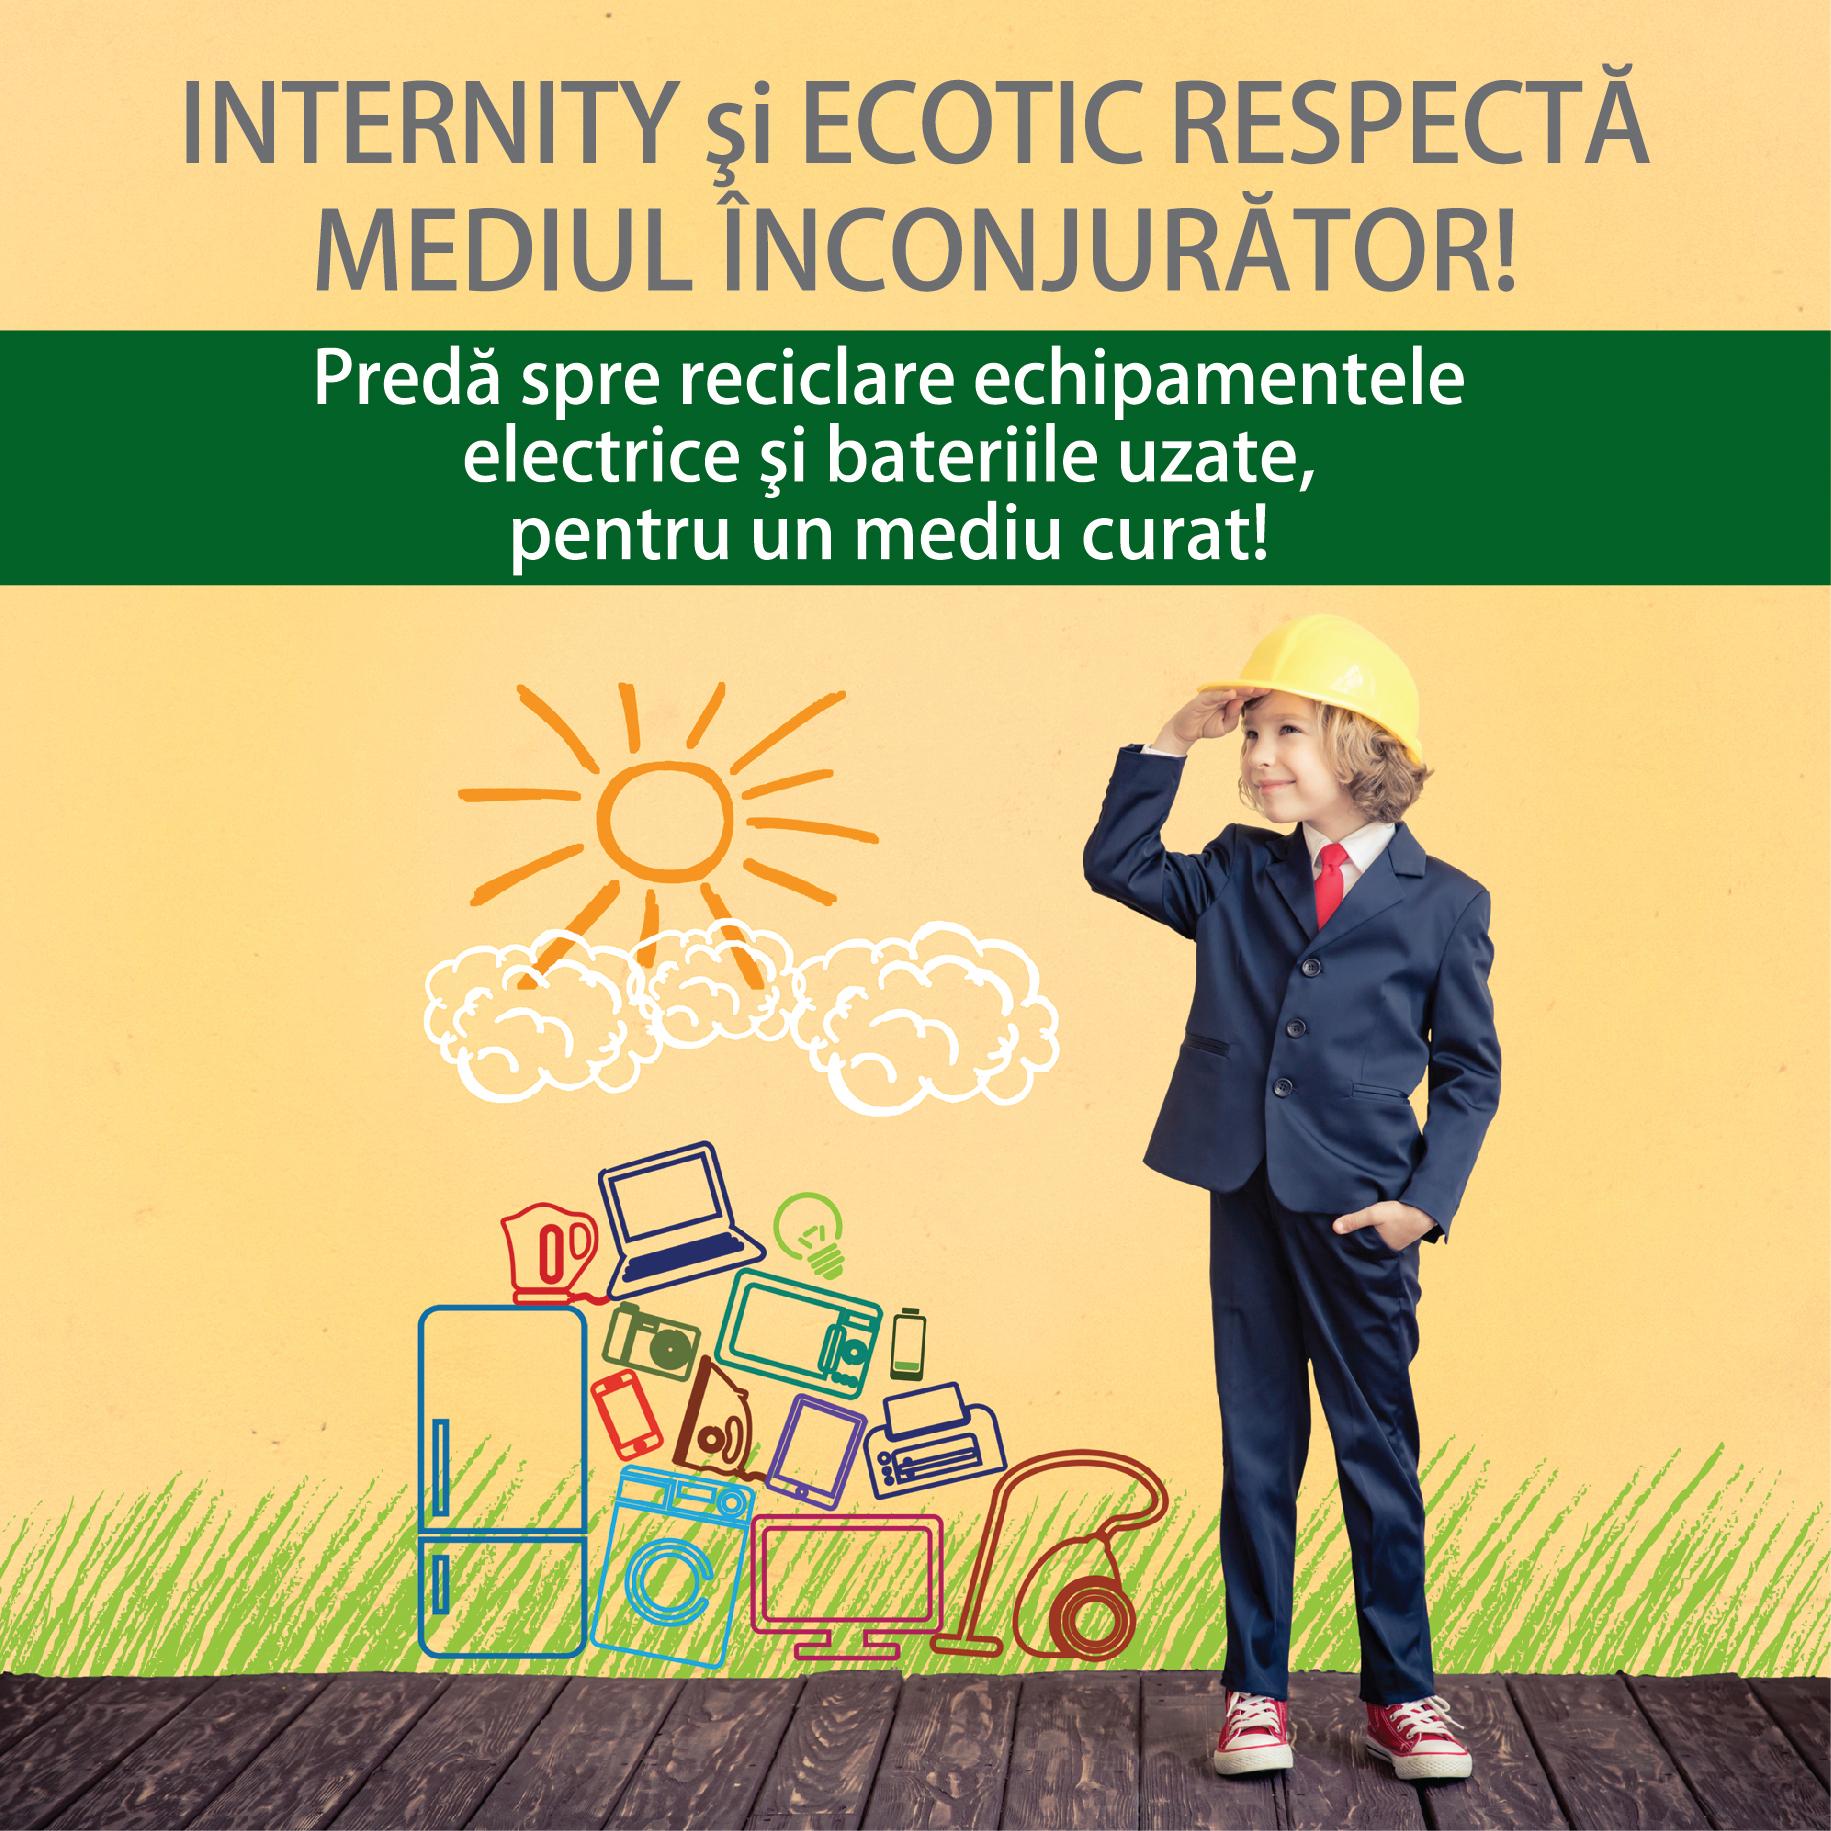 Internity respecta mediul inconjurator